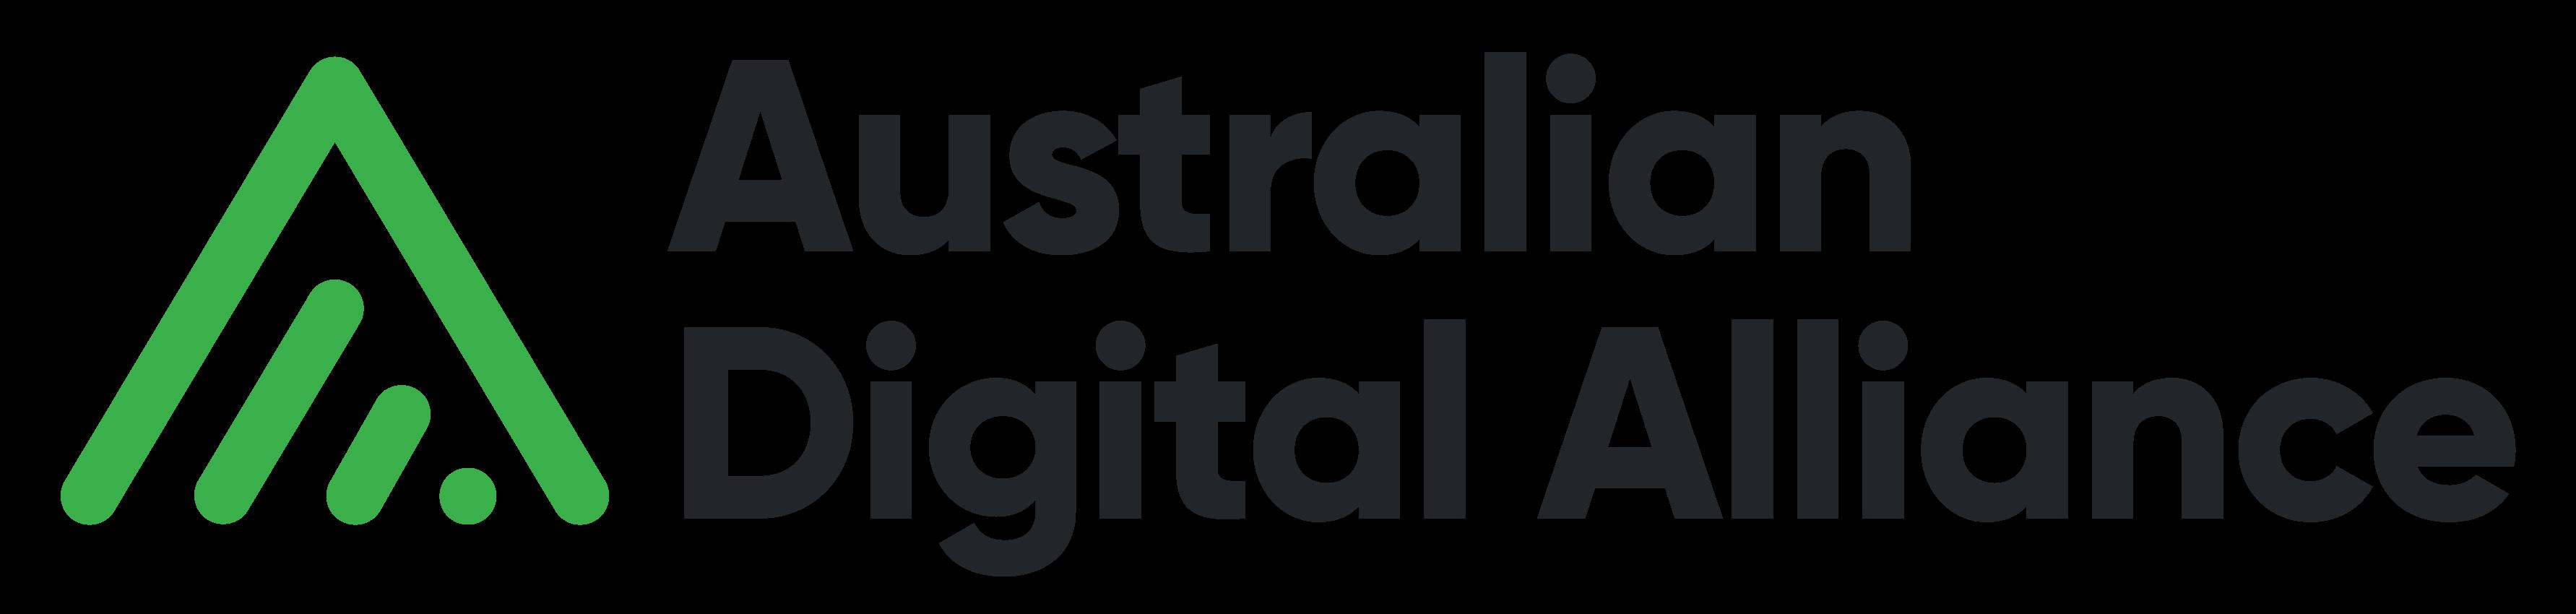 Australian Digital Alliance